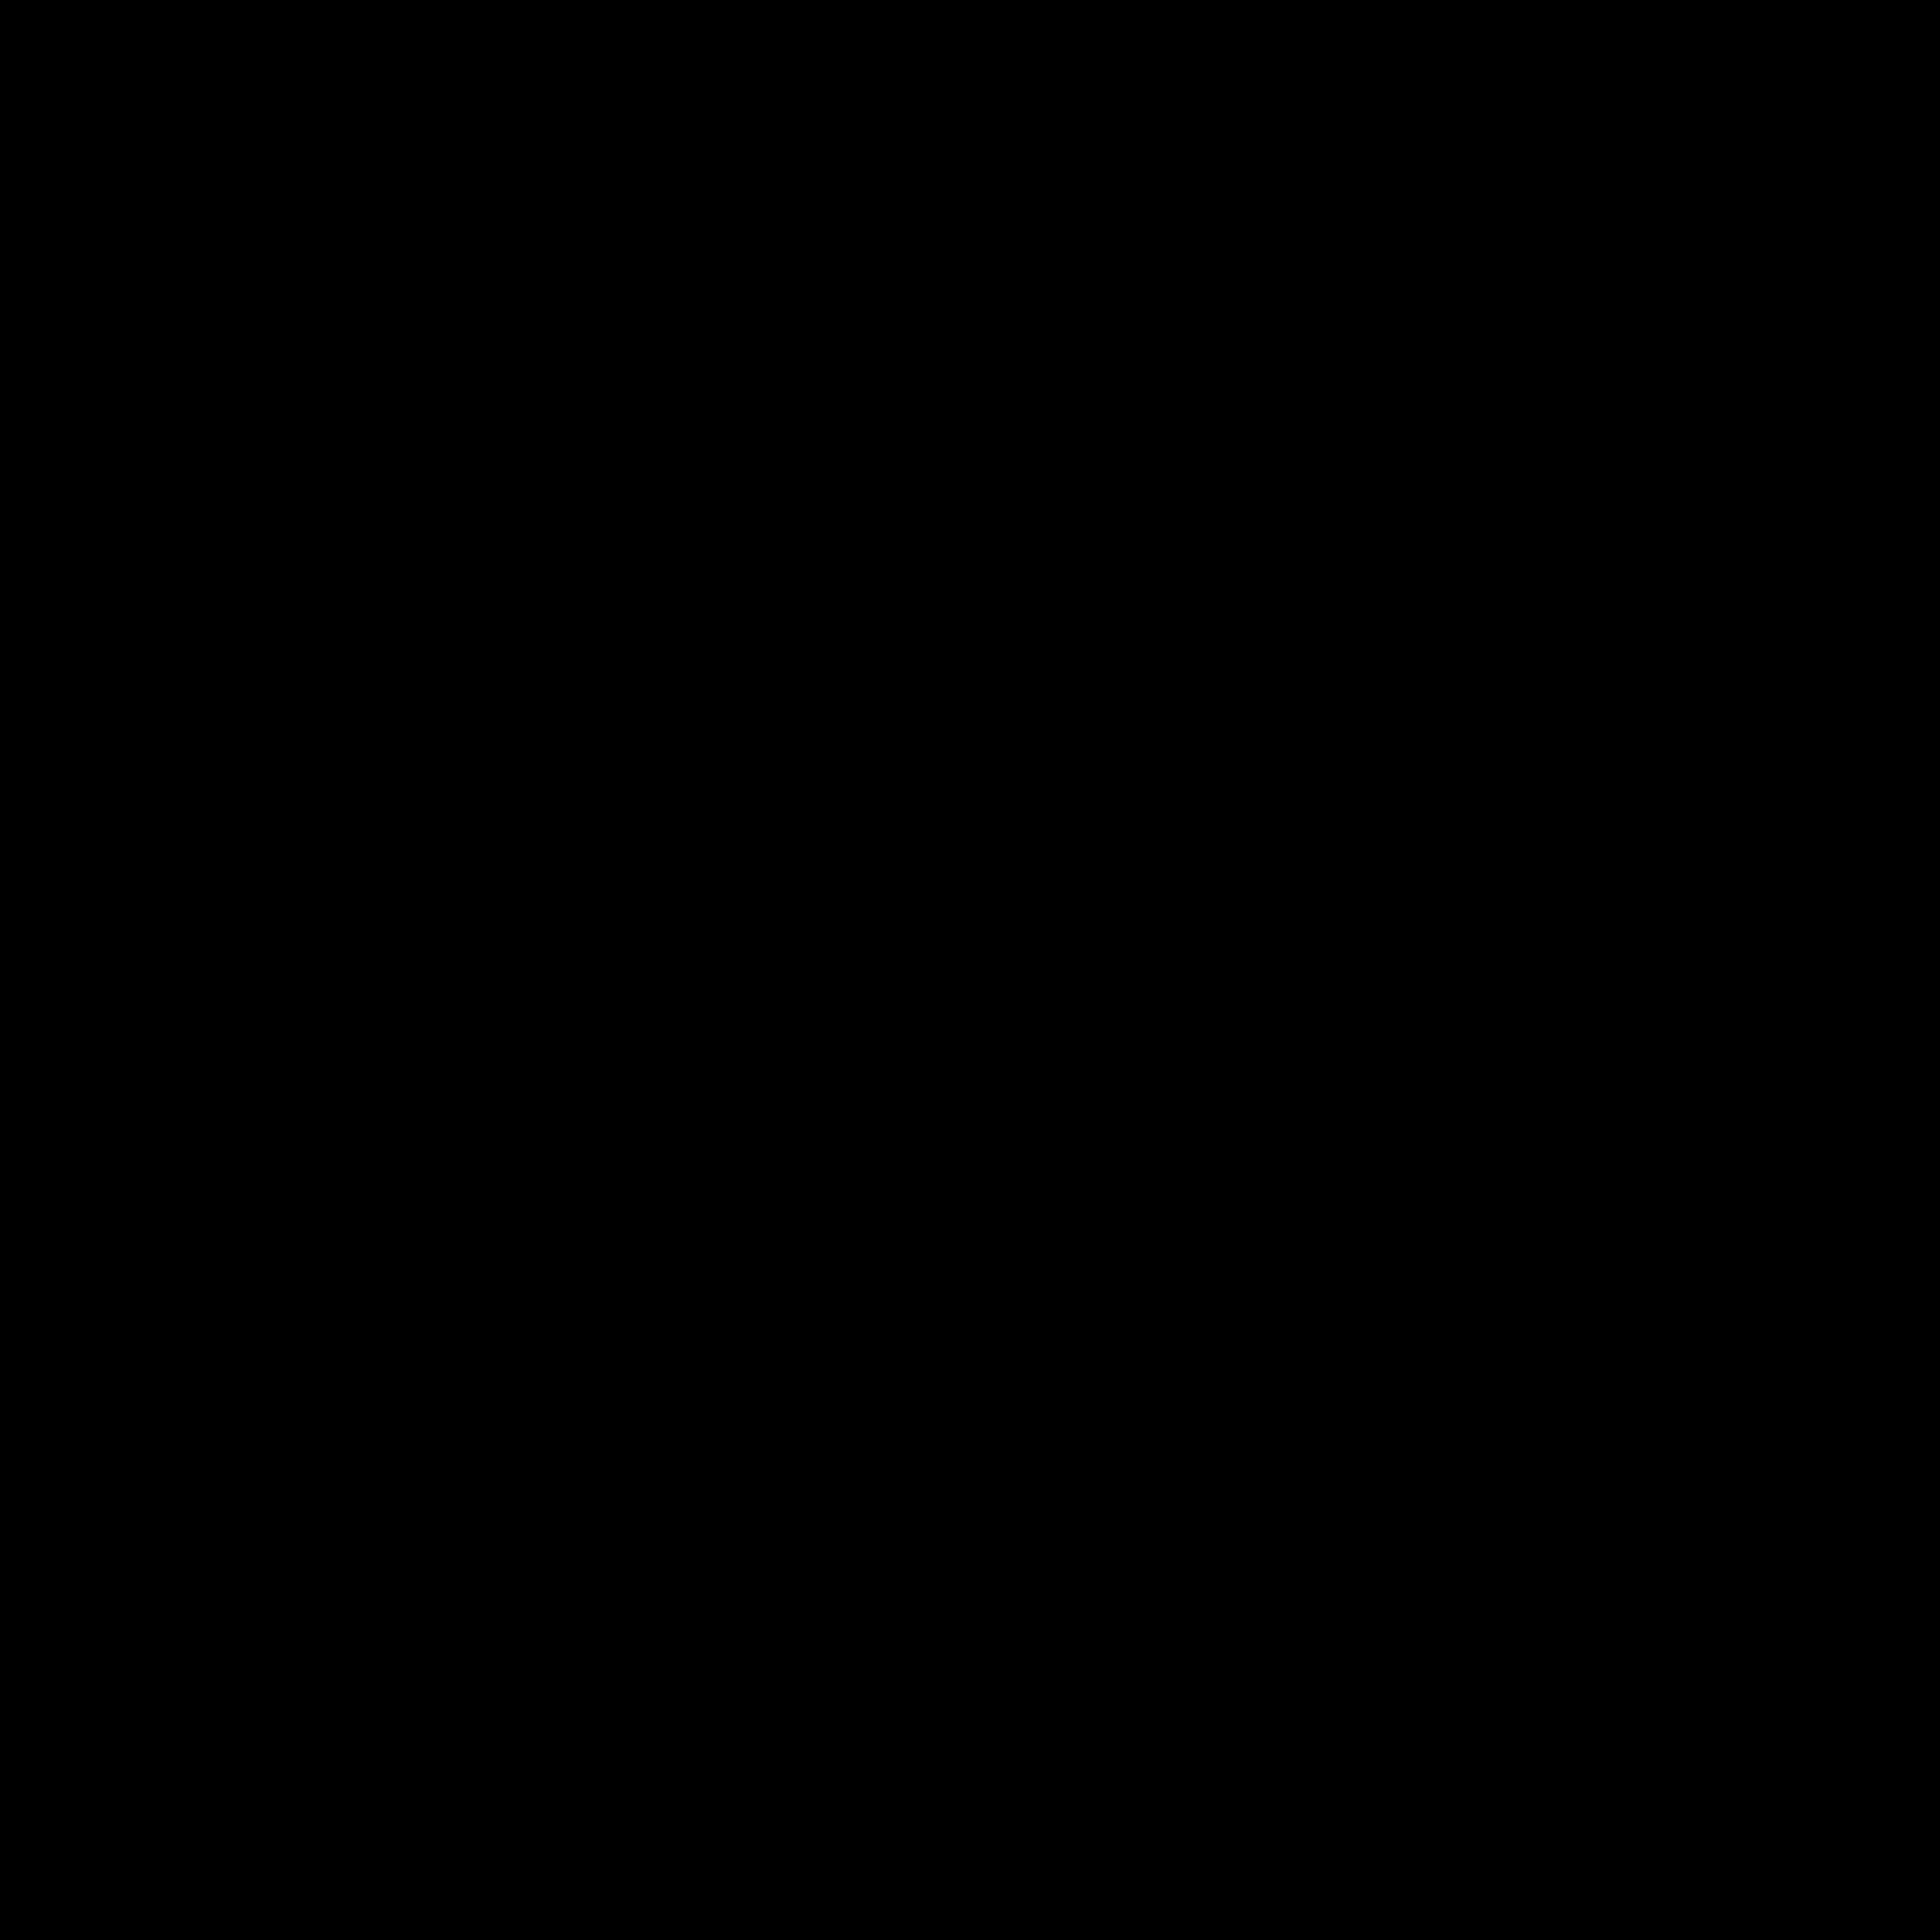 schwarzkopf-professional-logo-png-transparent.png